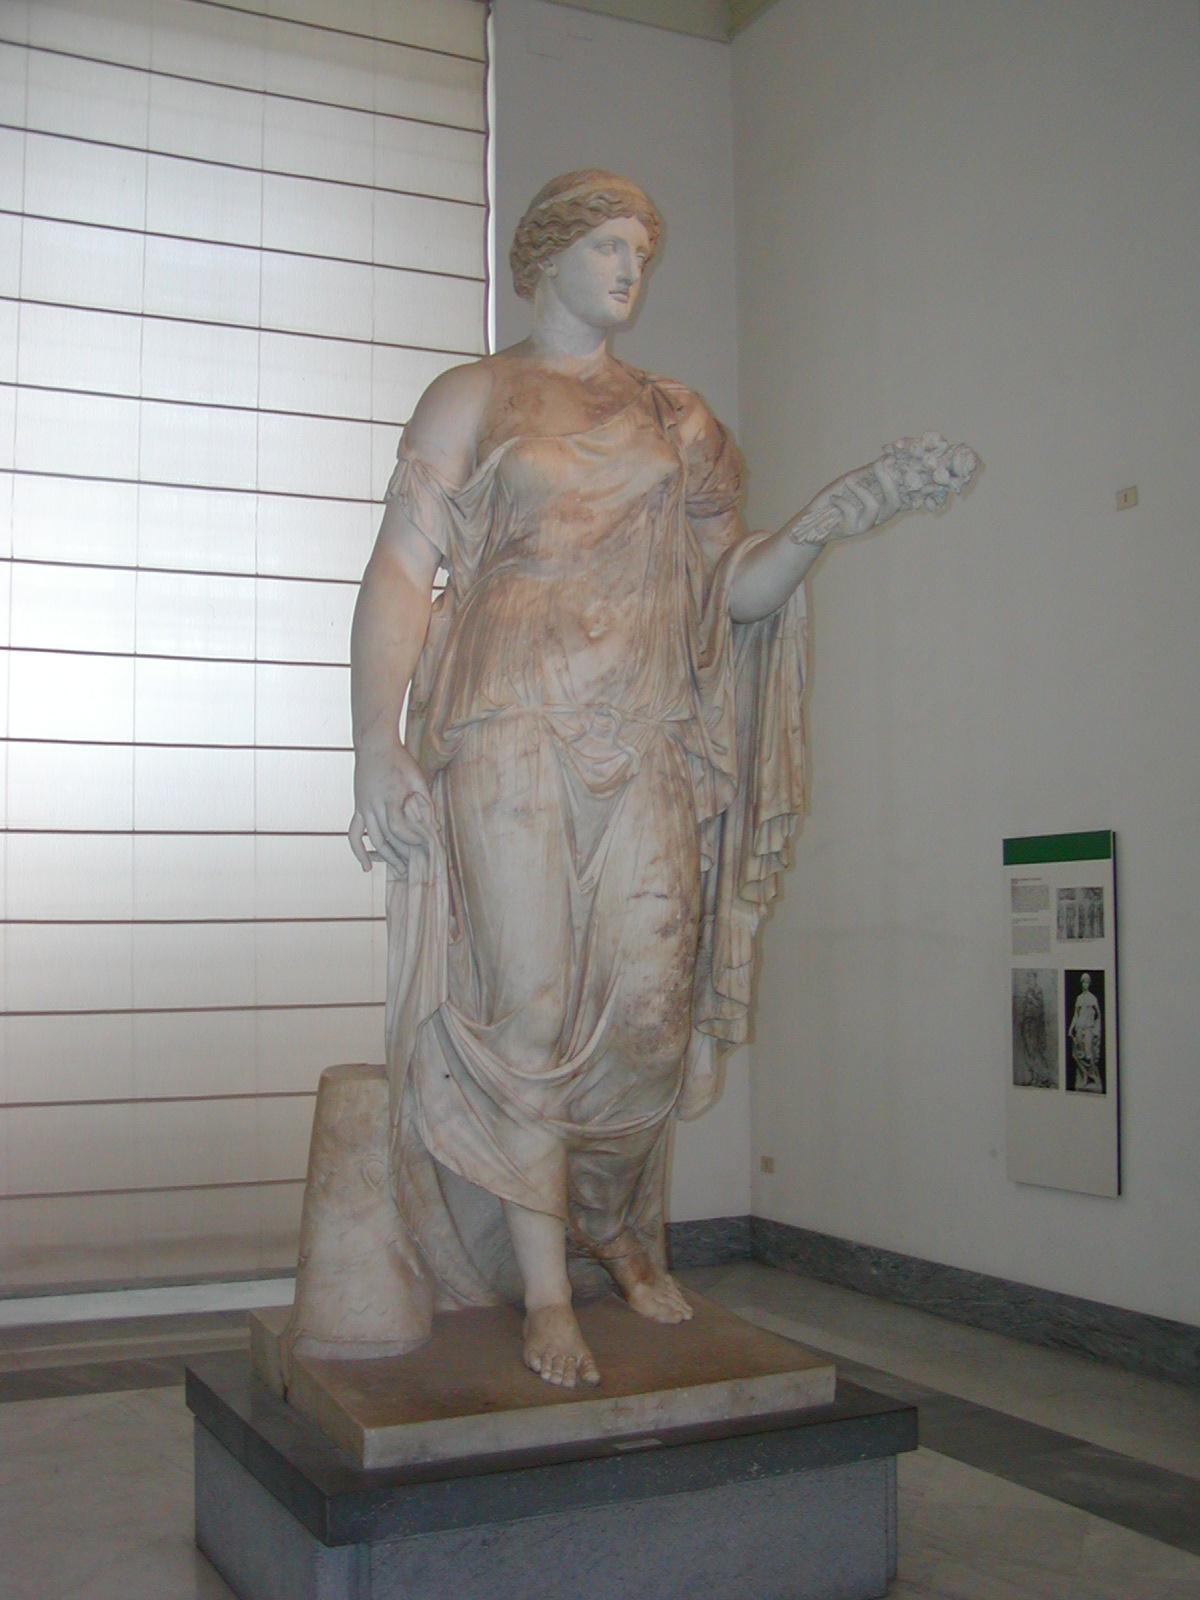 Museo Archeologico Nazionale - 2002-09-13-103020